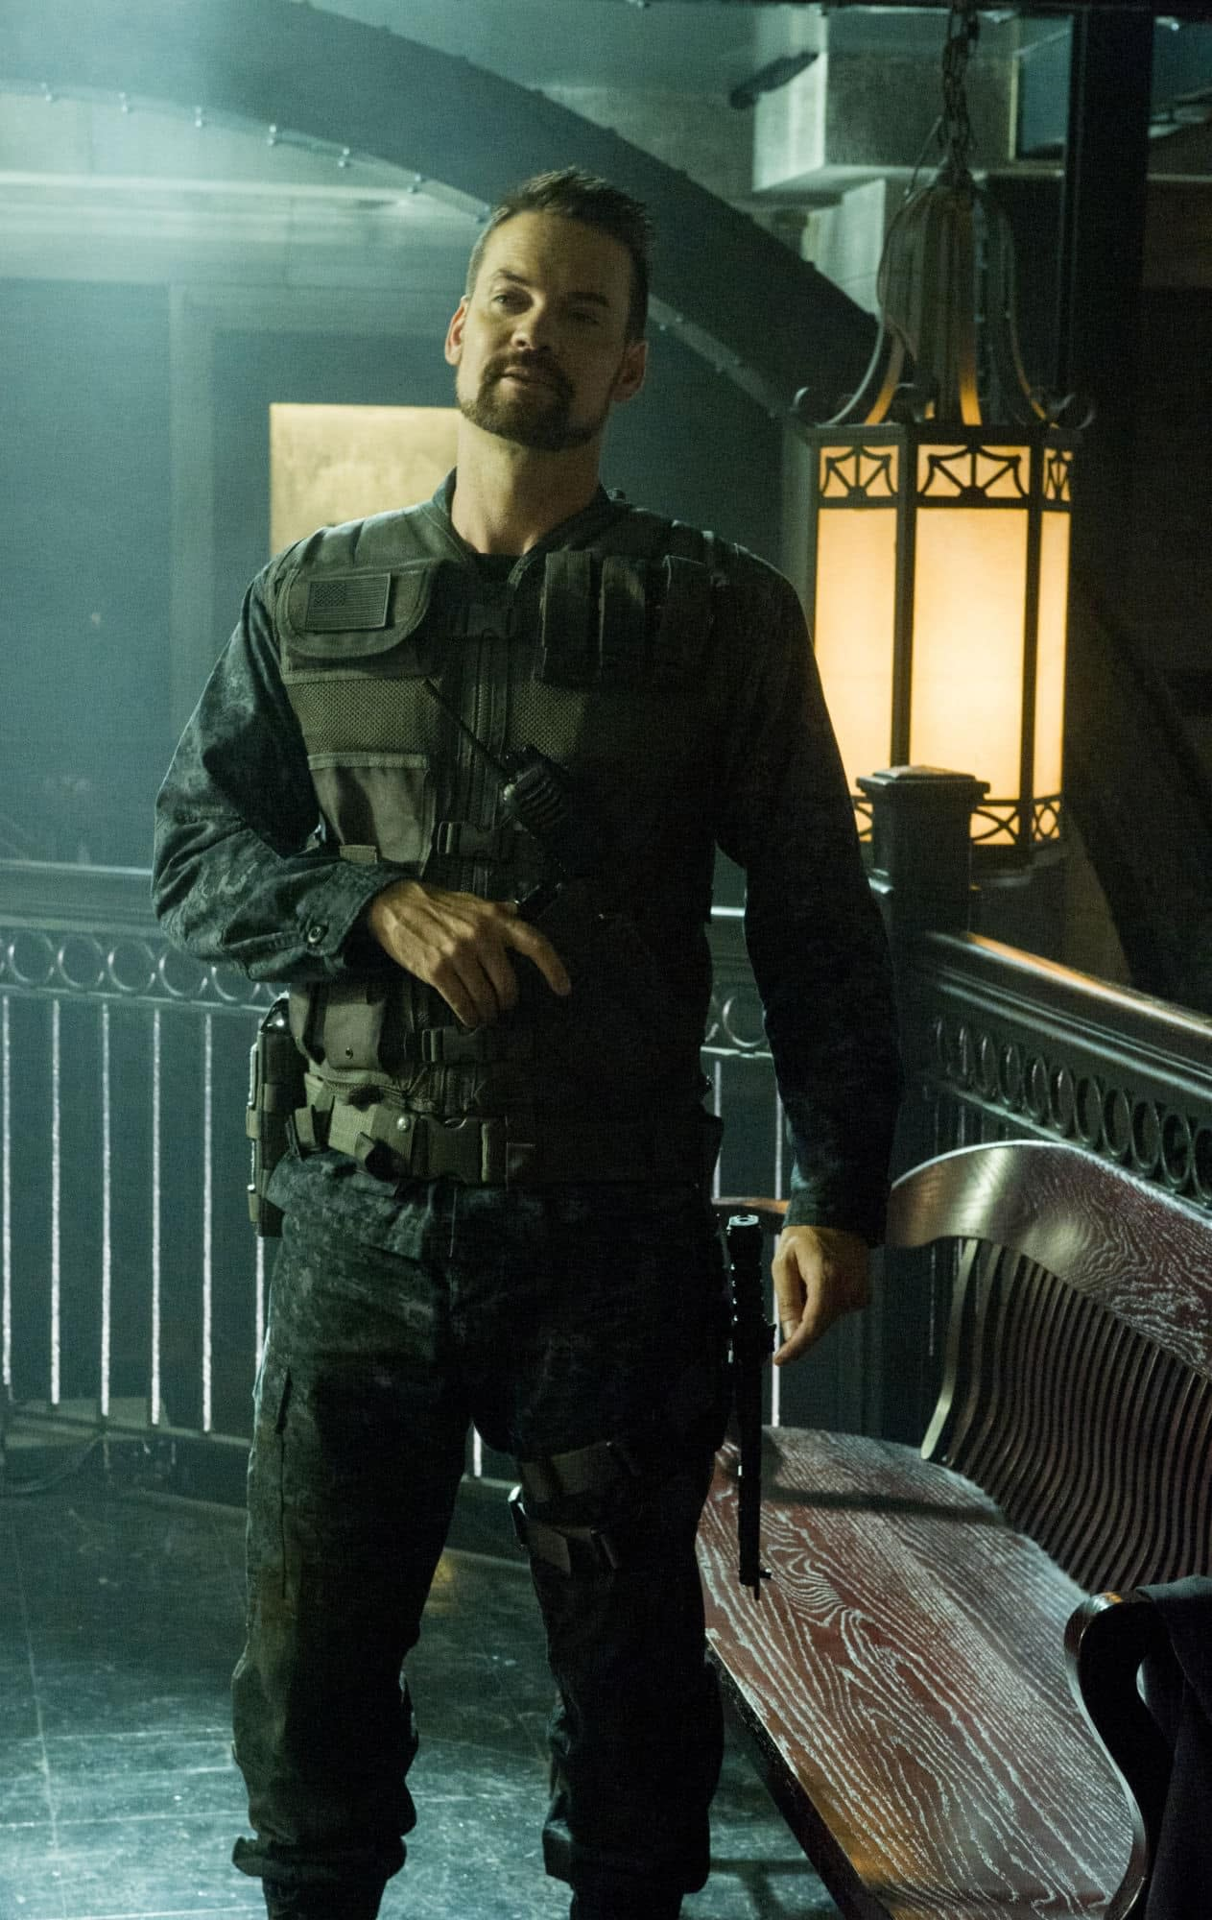 'Gotham' Back-Breaker Shane West Almost Frozen Out of Key Role